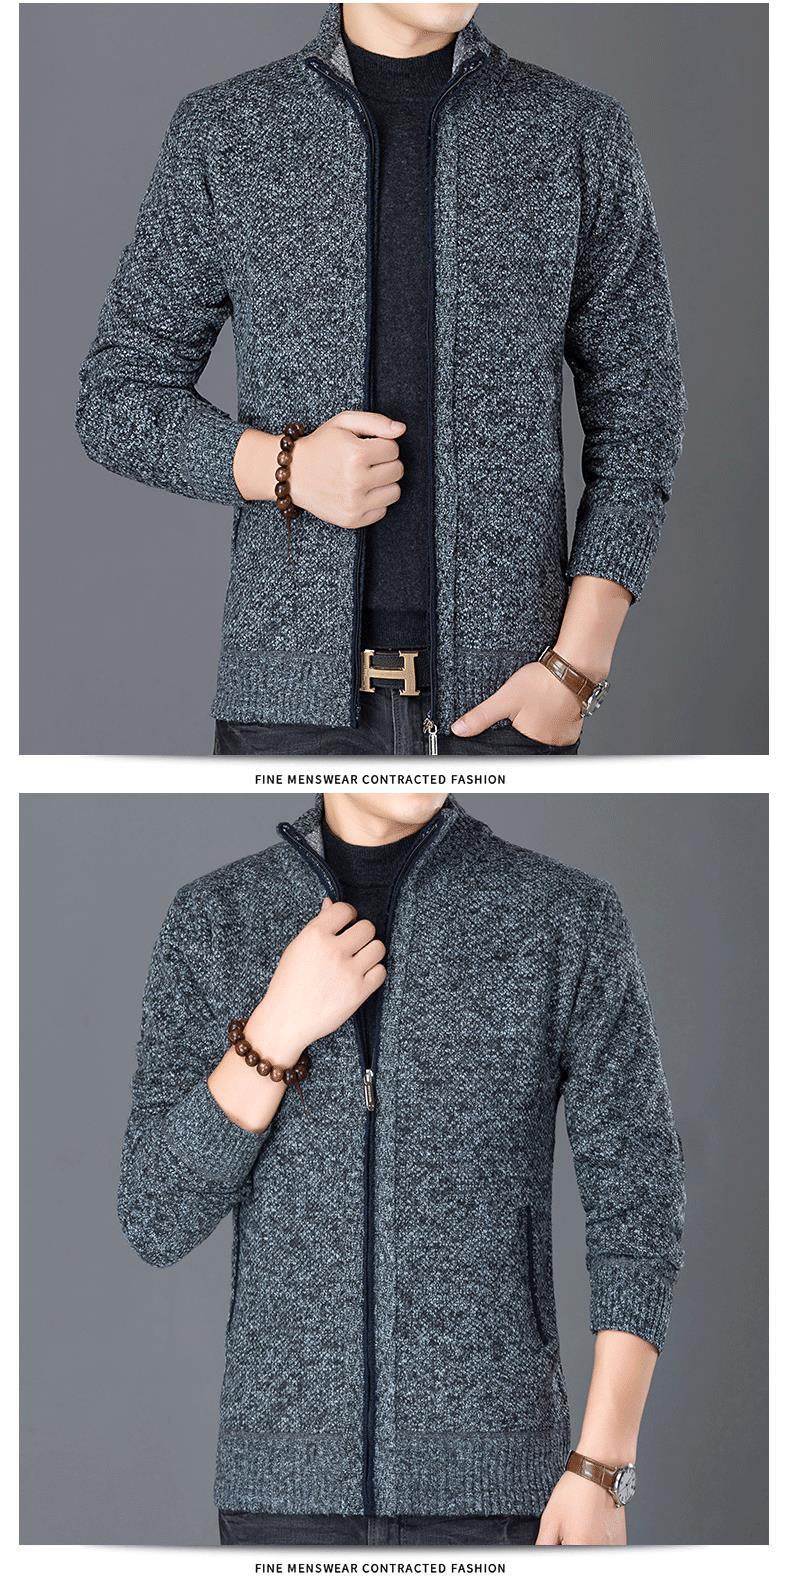 HTB1c5X.KeuSBuNjy1Xcq6AYjFXap 2019 New Fashion Wind Breaker Jackets Men Stand Collar Trend Street Style Overcoat Cardigan Autumn Casual Coat Mens Clothes